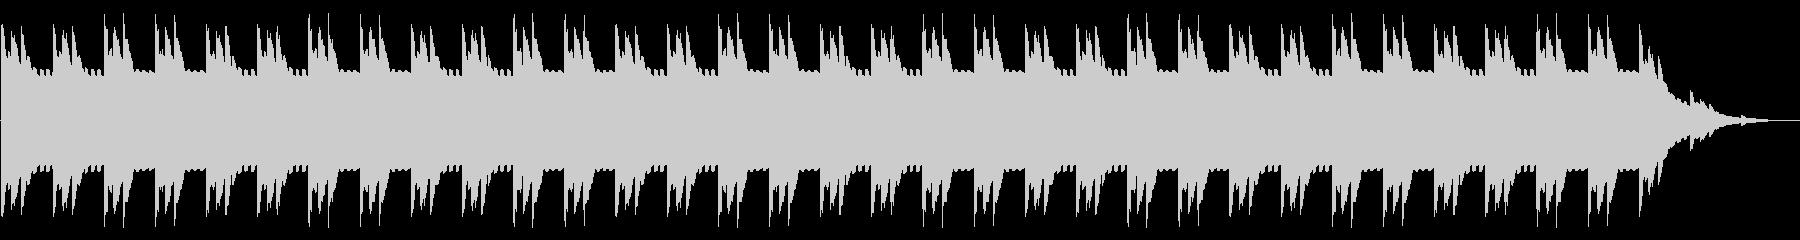 NES STG A01-1(ステージ) の未再生の波形